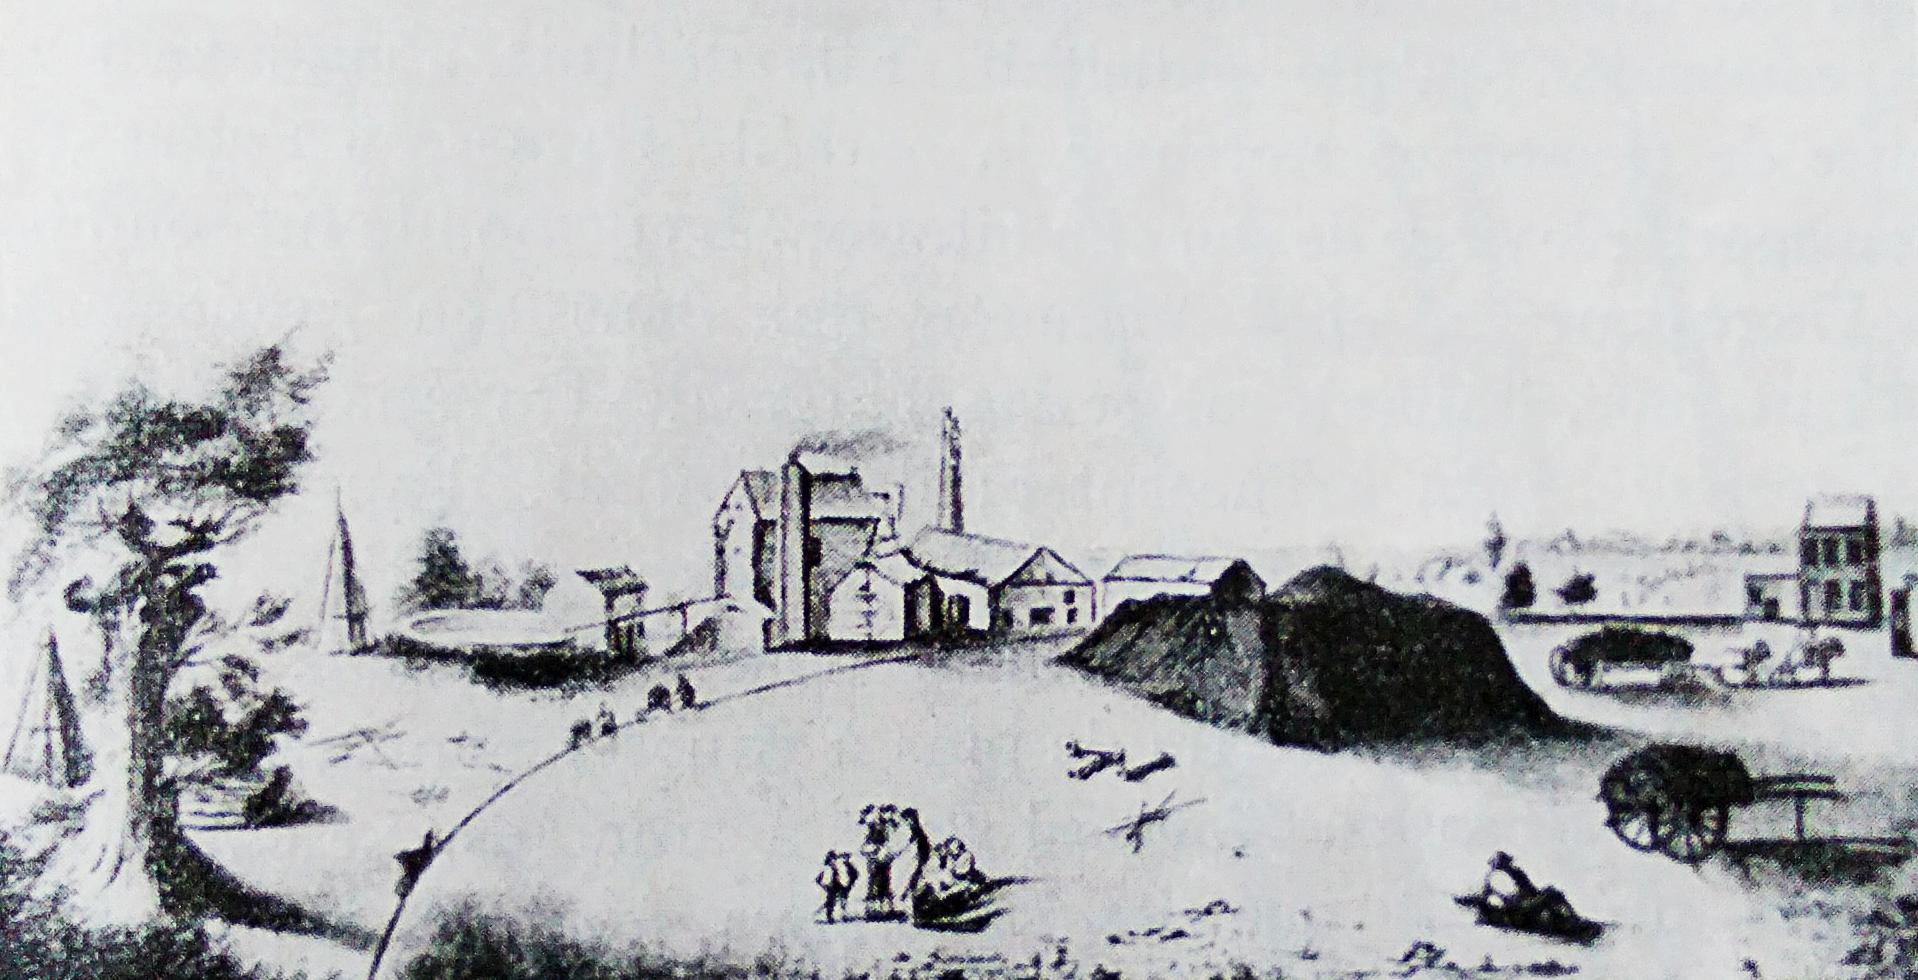 [1796]